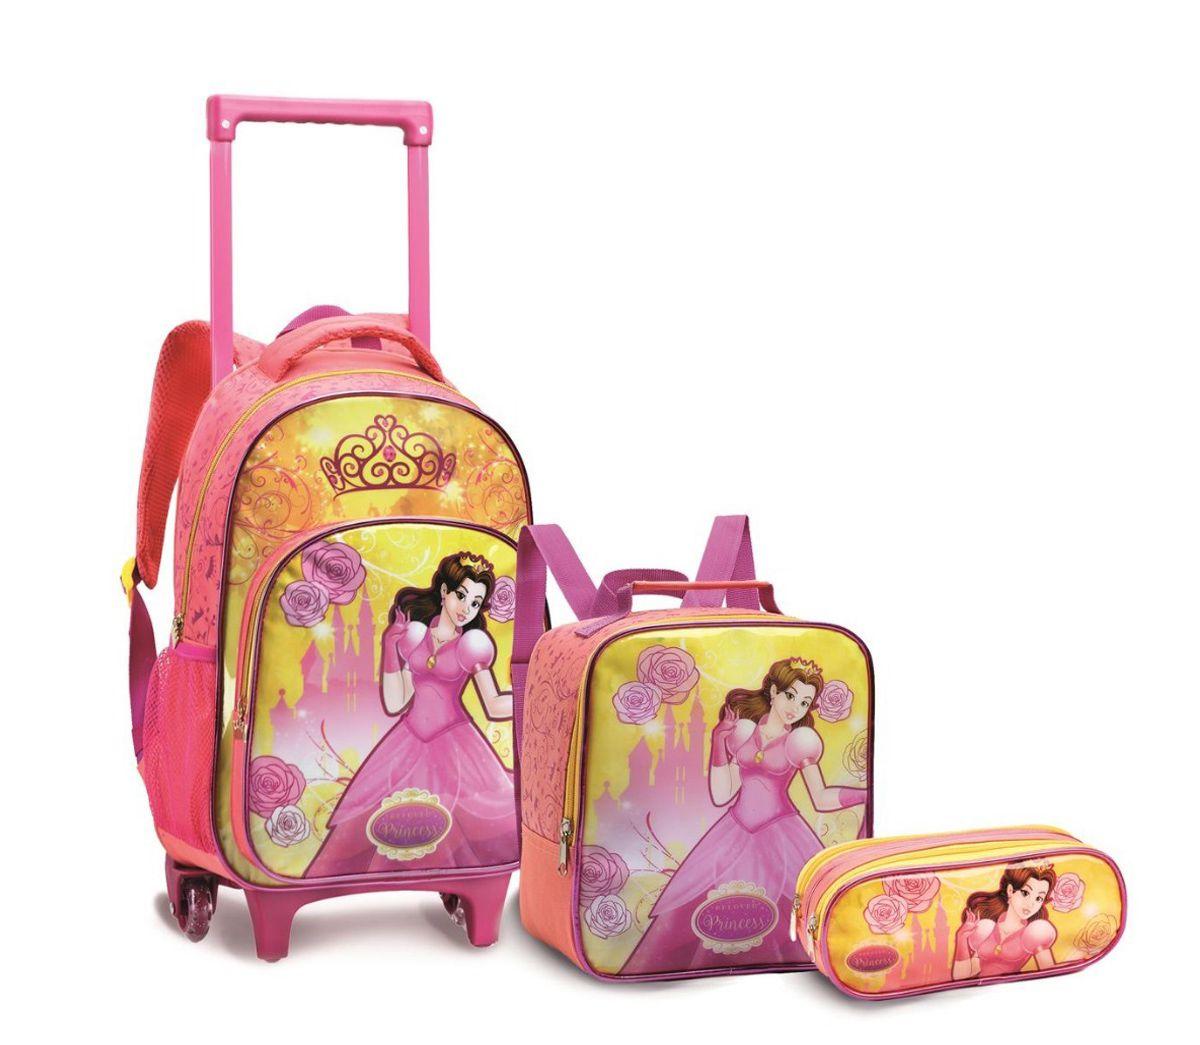 Kit Mochila Carrinho Infantil Menina 13951 Princesas Amarelo